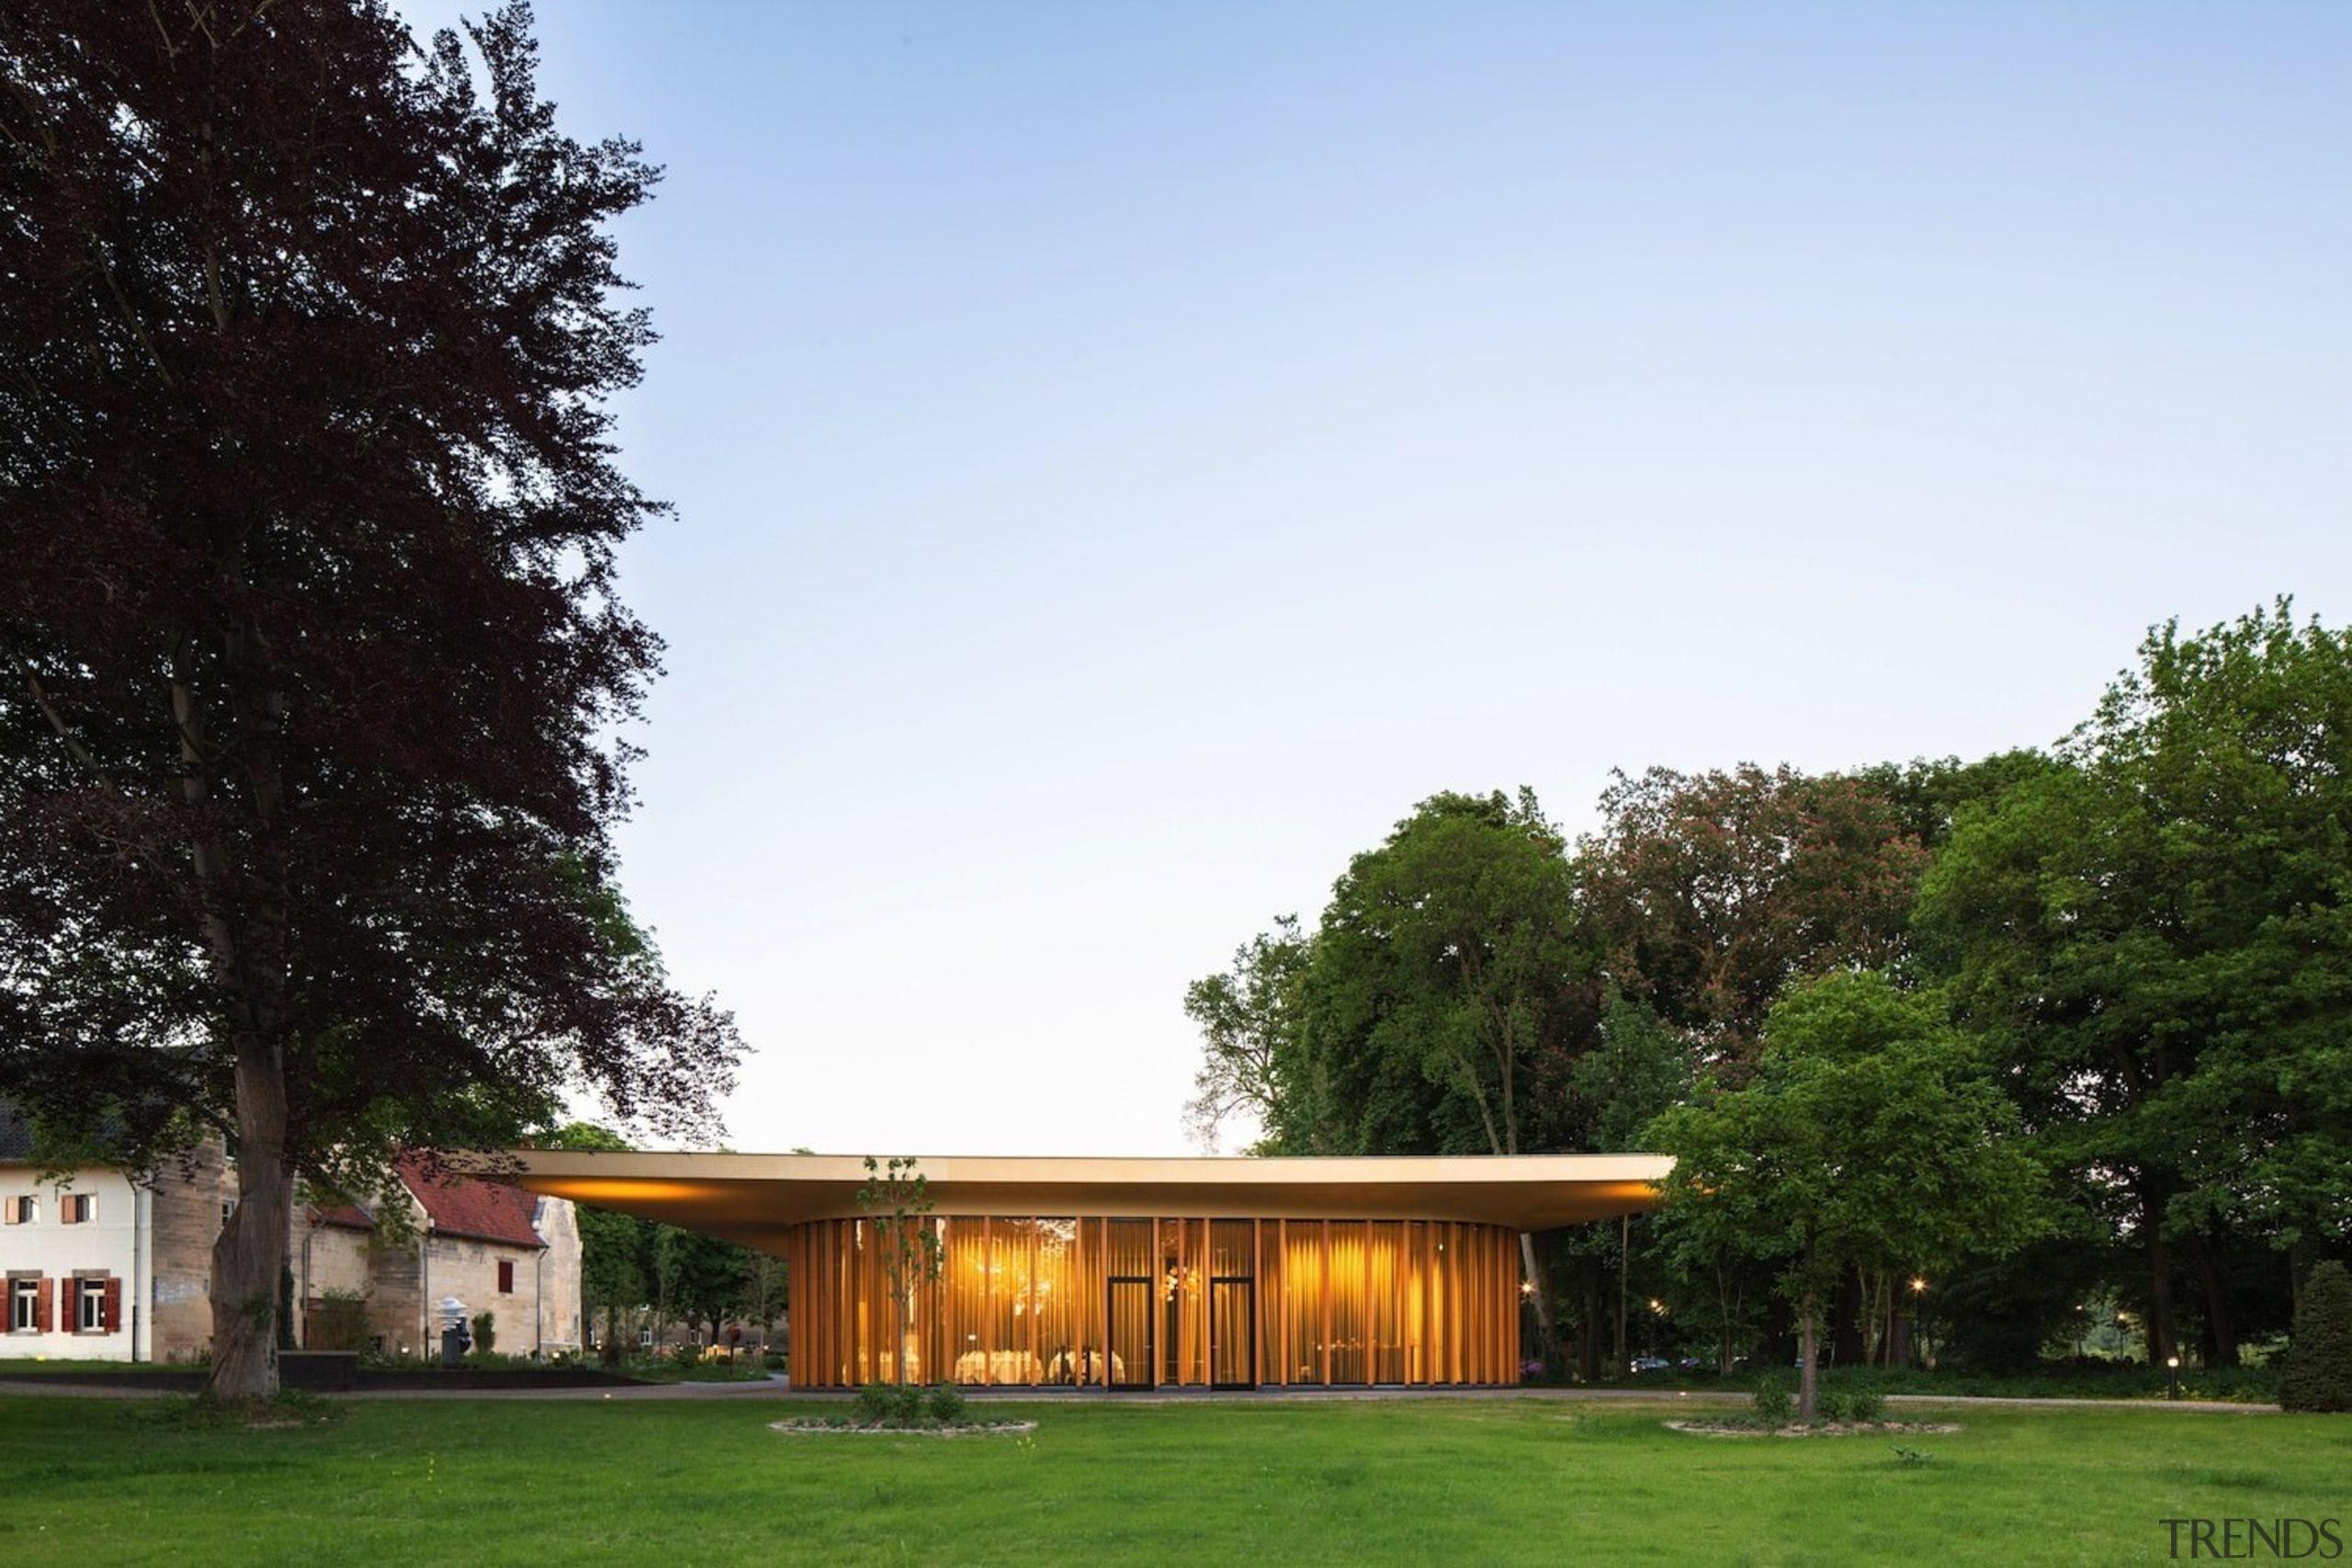 Architect: Meccanoo architecture, cottage, estate, facade, farmhouse, grass, home, house, landscape, pavilion, property, real estate, residential area, roof, sky, tree, white